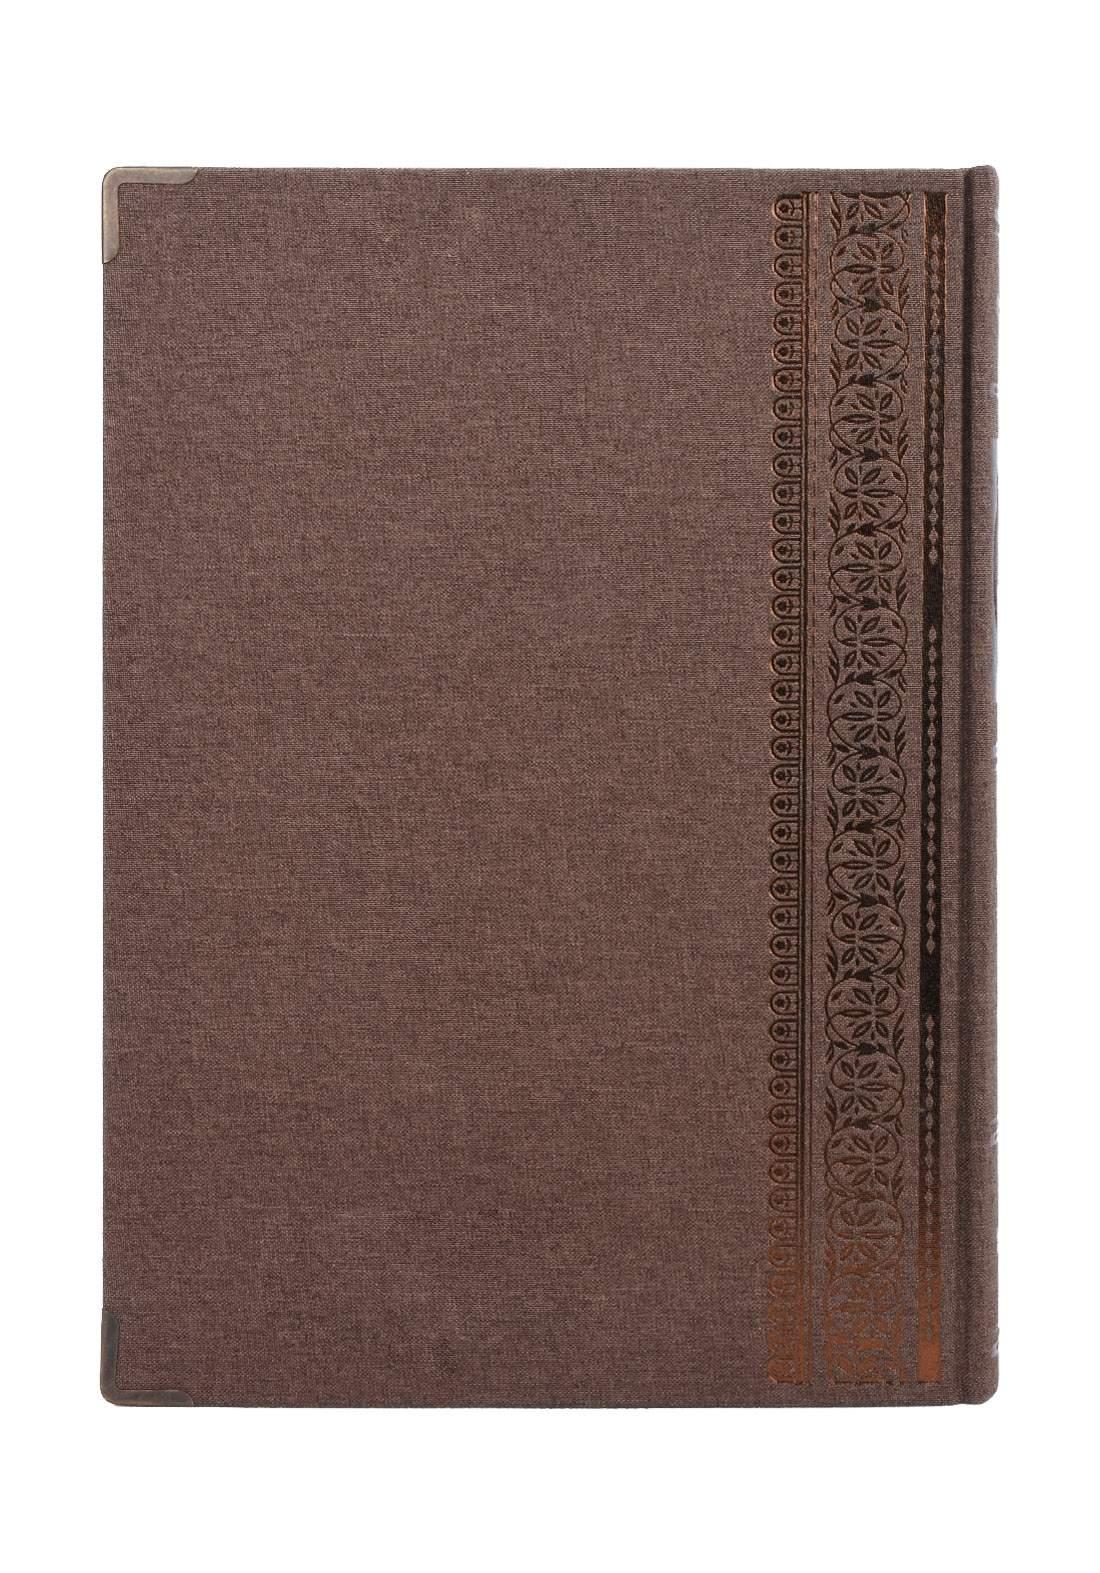 Tarsi (1438-20070) 160 Sheets Drawing Book دفتر رسم تارسي 160ورقة